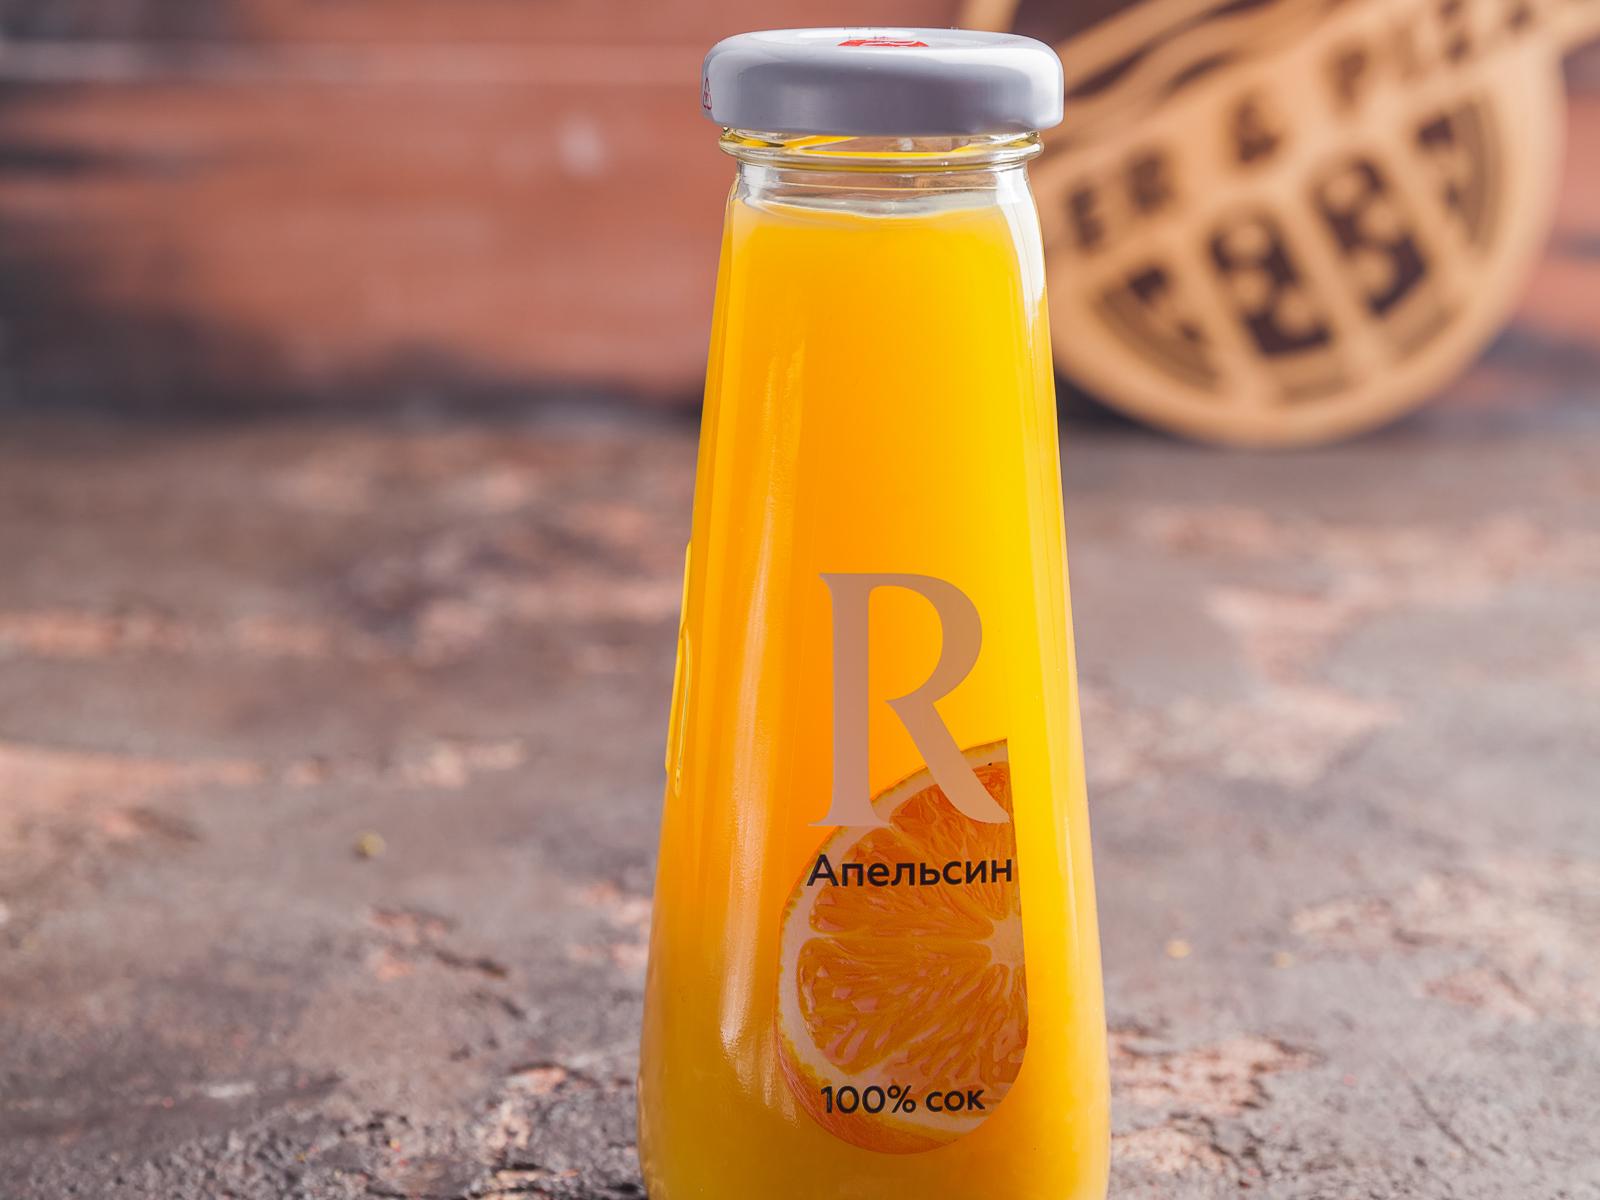 Сок Riсh Апельсин